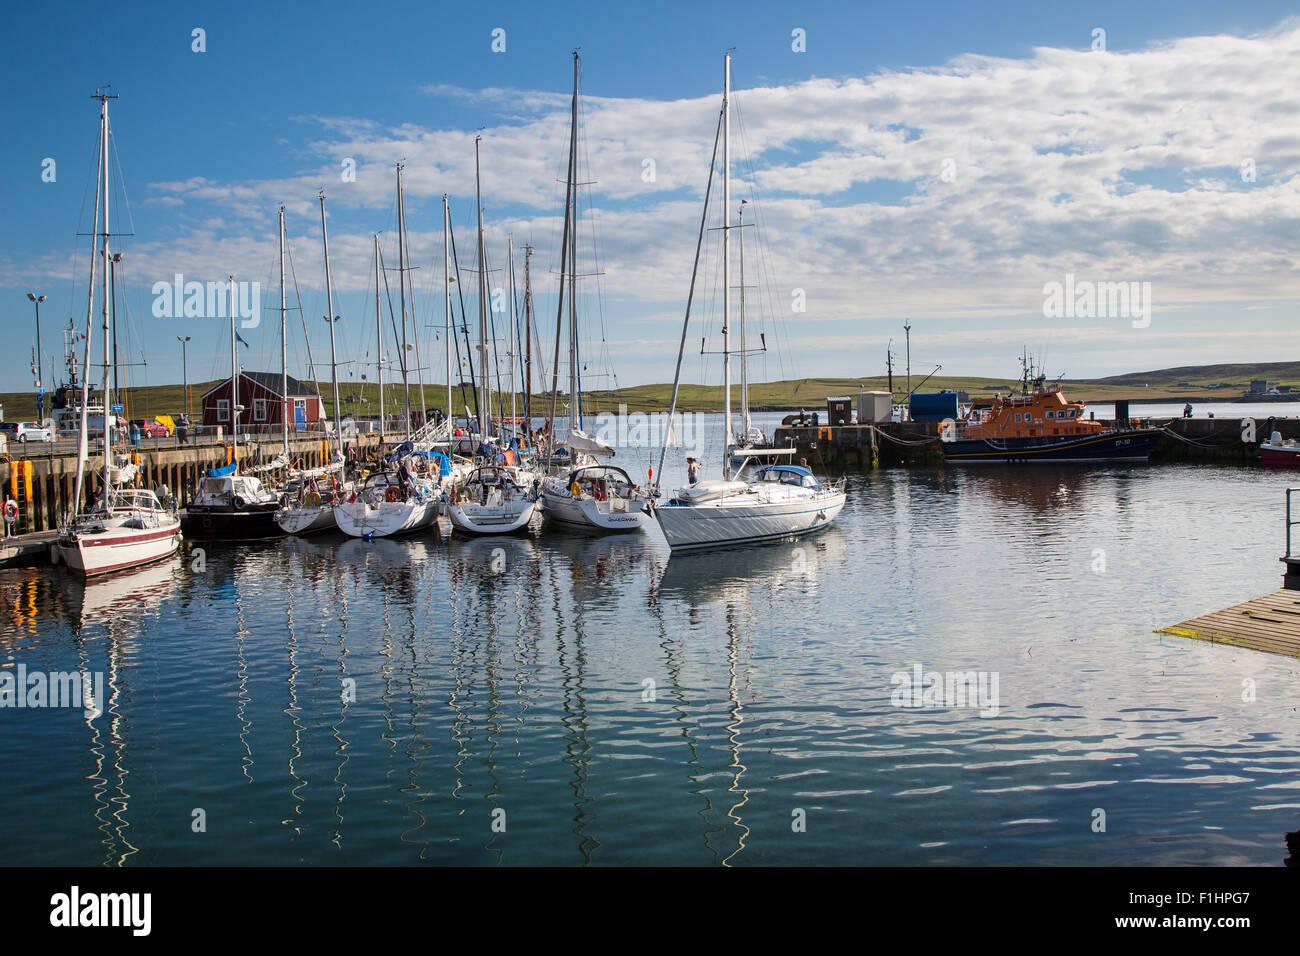 The Harbour Lerwick, Shetland Islands, Scotland - Stock Image